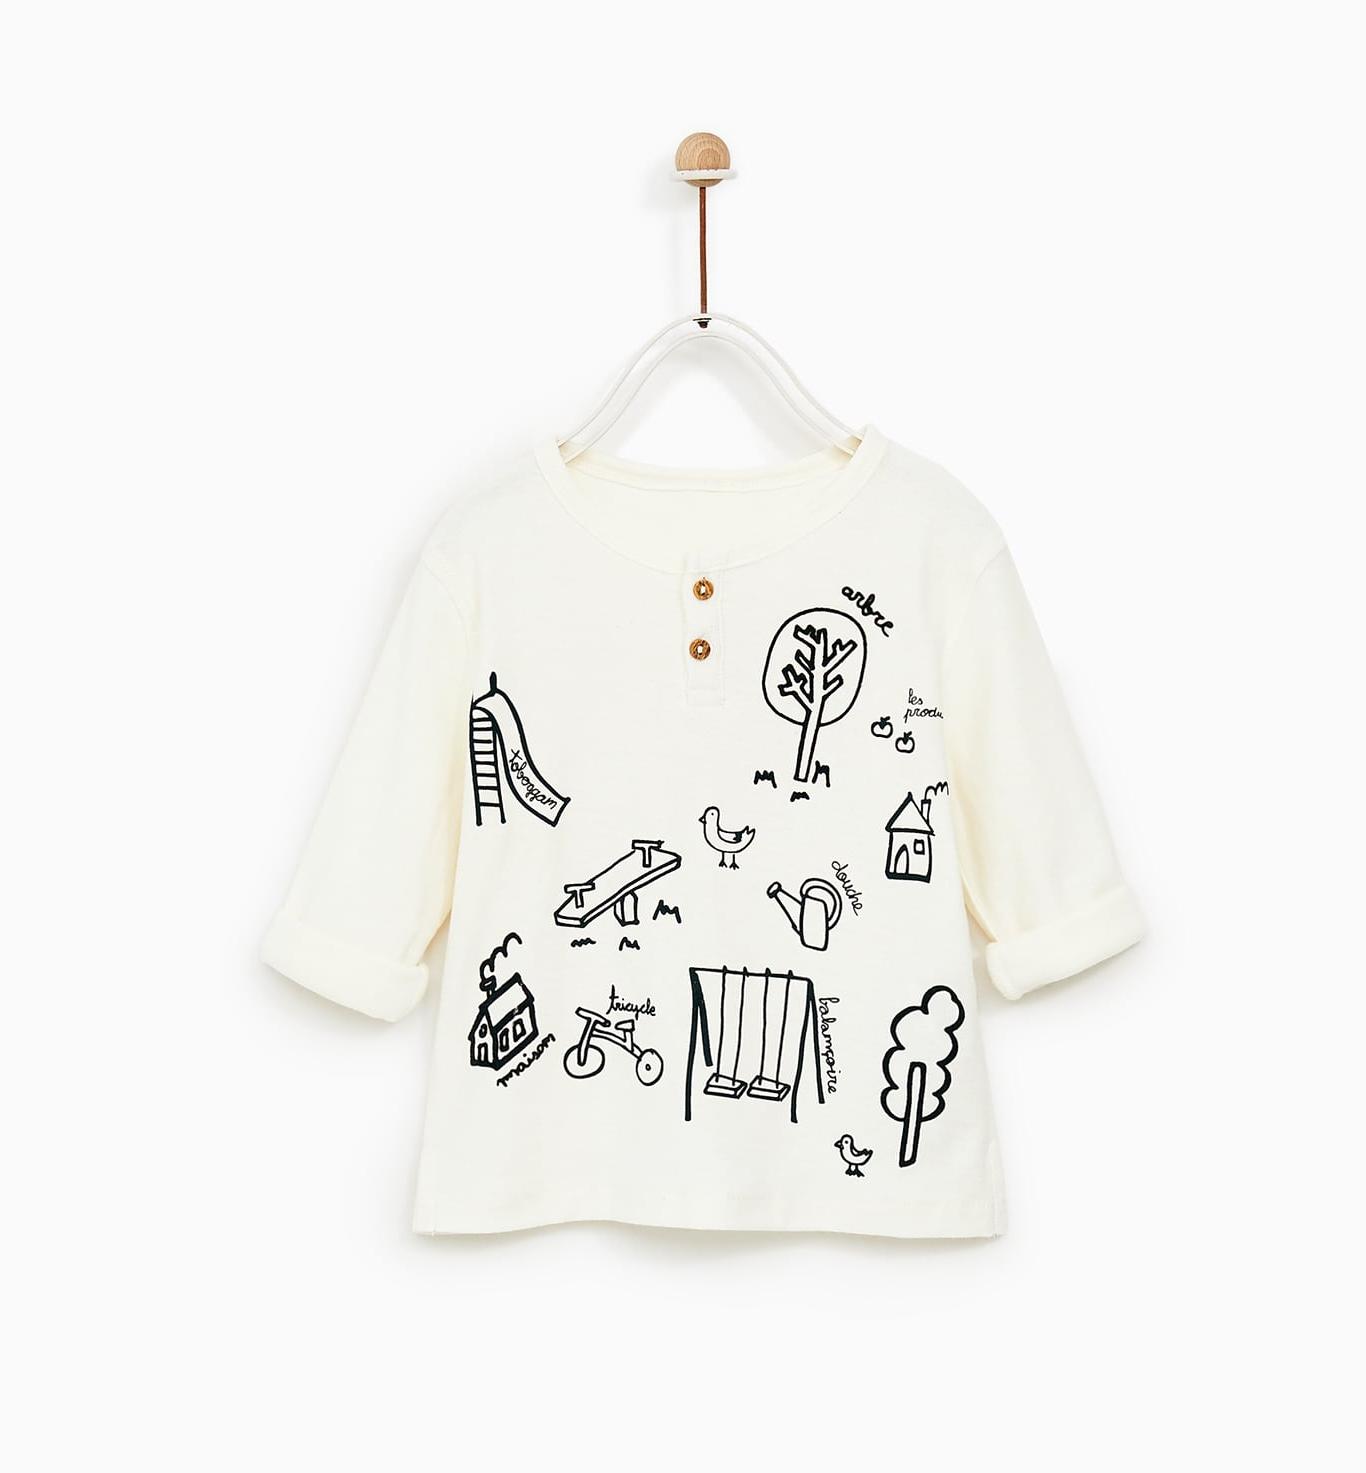 Printed T-Shirt $12.95